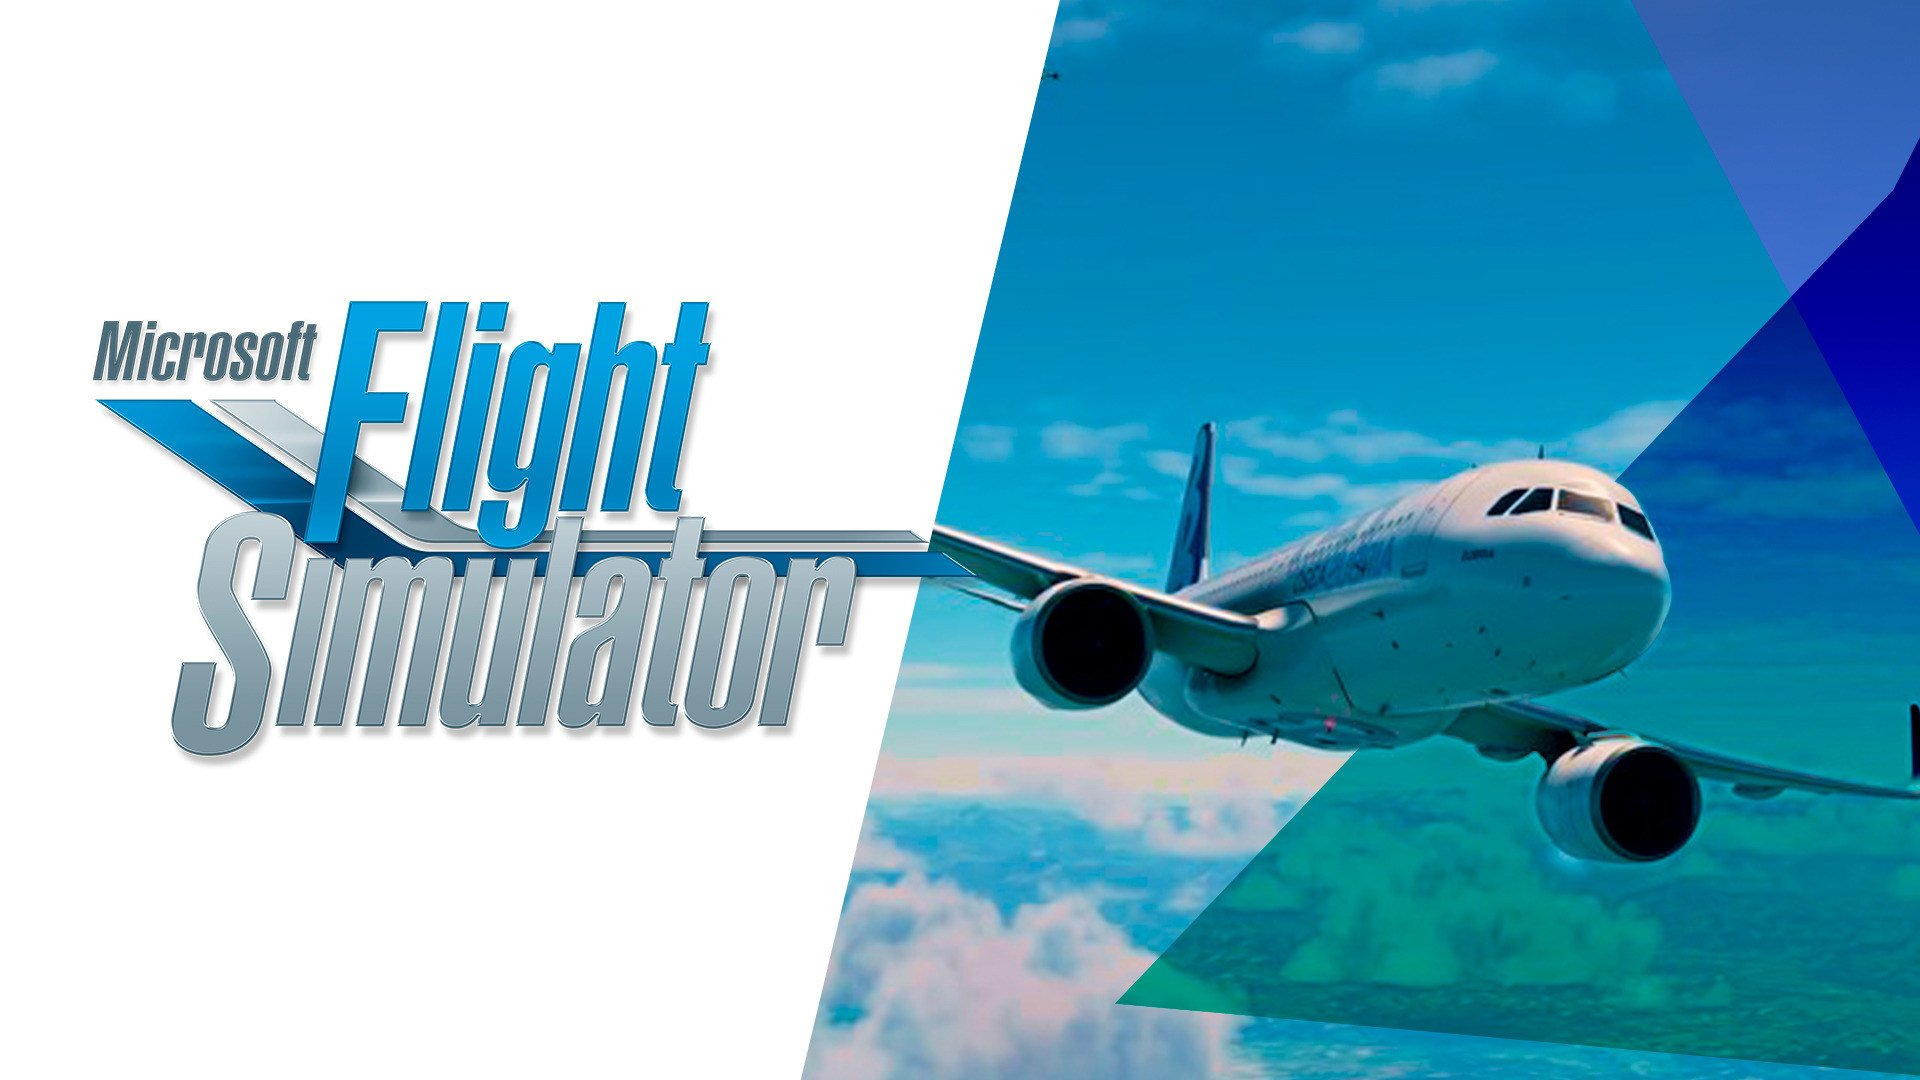 Microsoft, Gaming, Spiele, Games, Flugzeug, flugsimulation, Flight Simulator, Flight Simulator 2020, Microsoft Flight Simulator, Flugsimulator, Microsoft Flight Simulator 2020, FlightSim, GamePass, Microsoft GamePass, FSX, FSXX